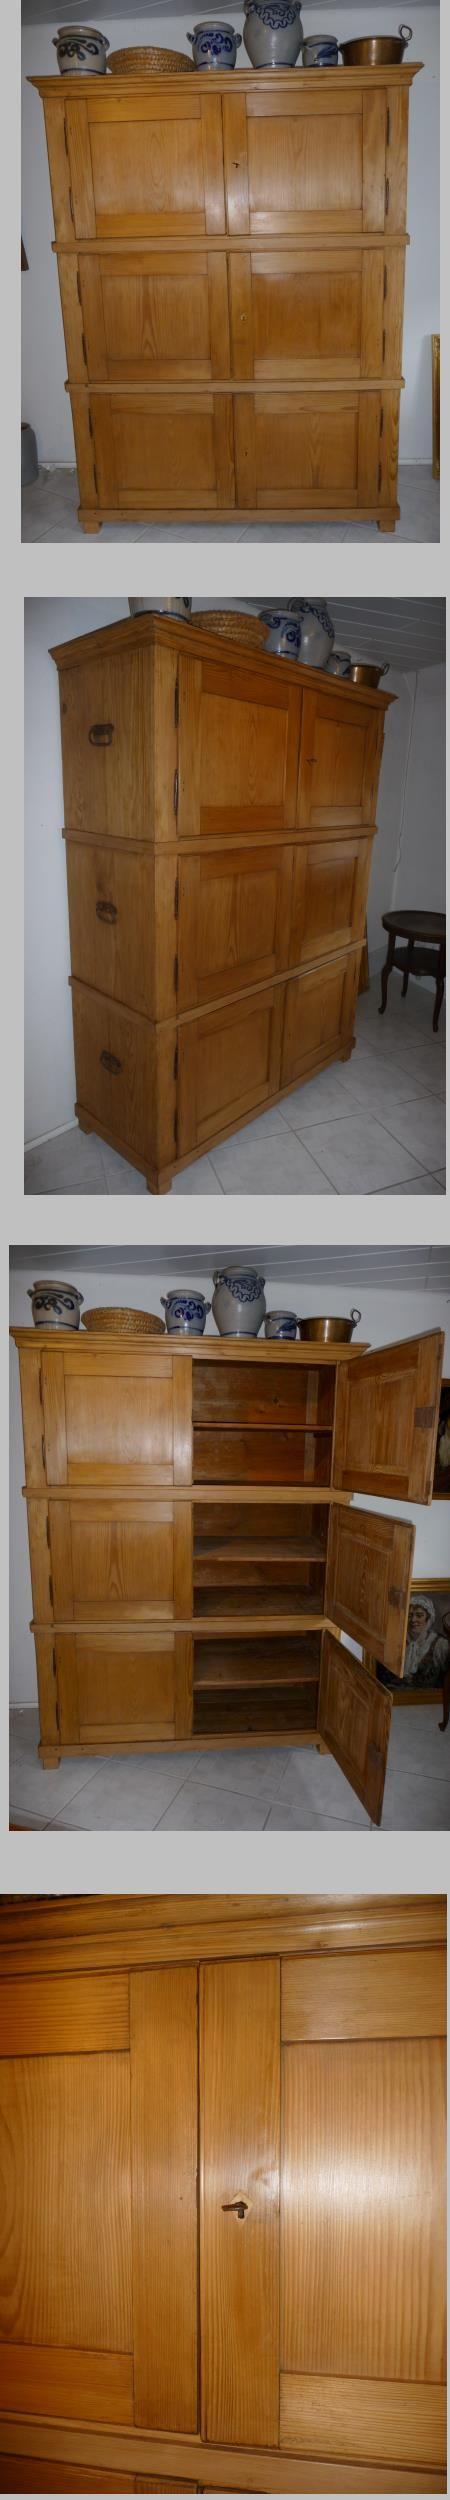 Beautiful Antiker Brandschrank Biedermeier um aus dem Raum Heilbronn Konrad Antiquit ten Ankauf Verkauf Restaurierungen M bel